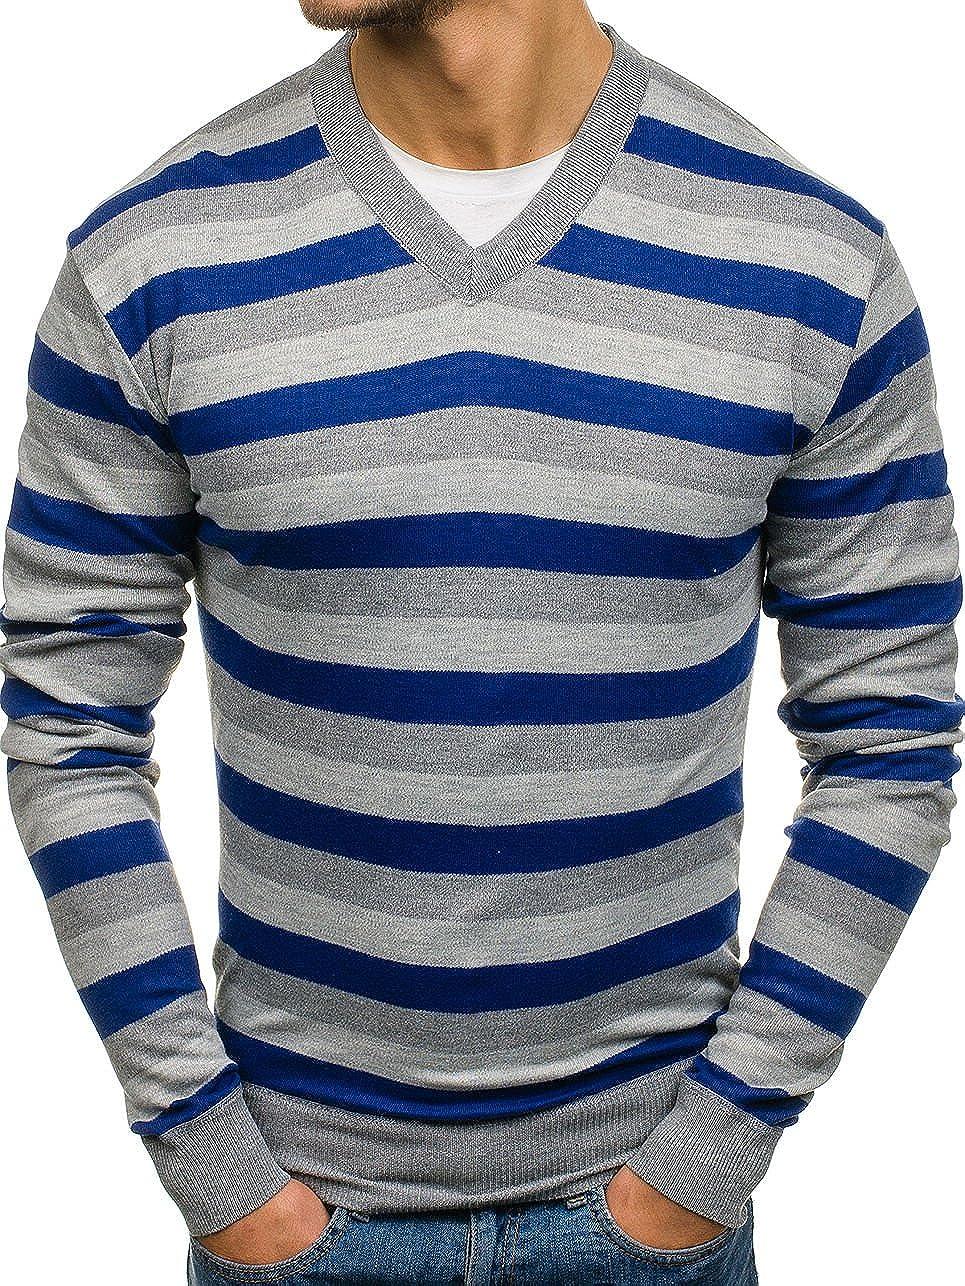 Herren Pullover Strickjacke Strickpullover Sweater Men Rundhals BOLF 5E5 Motiv